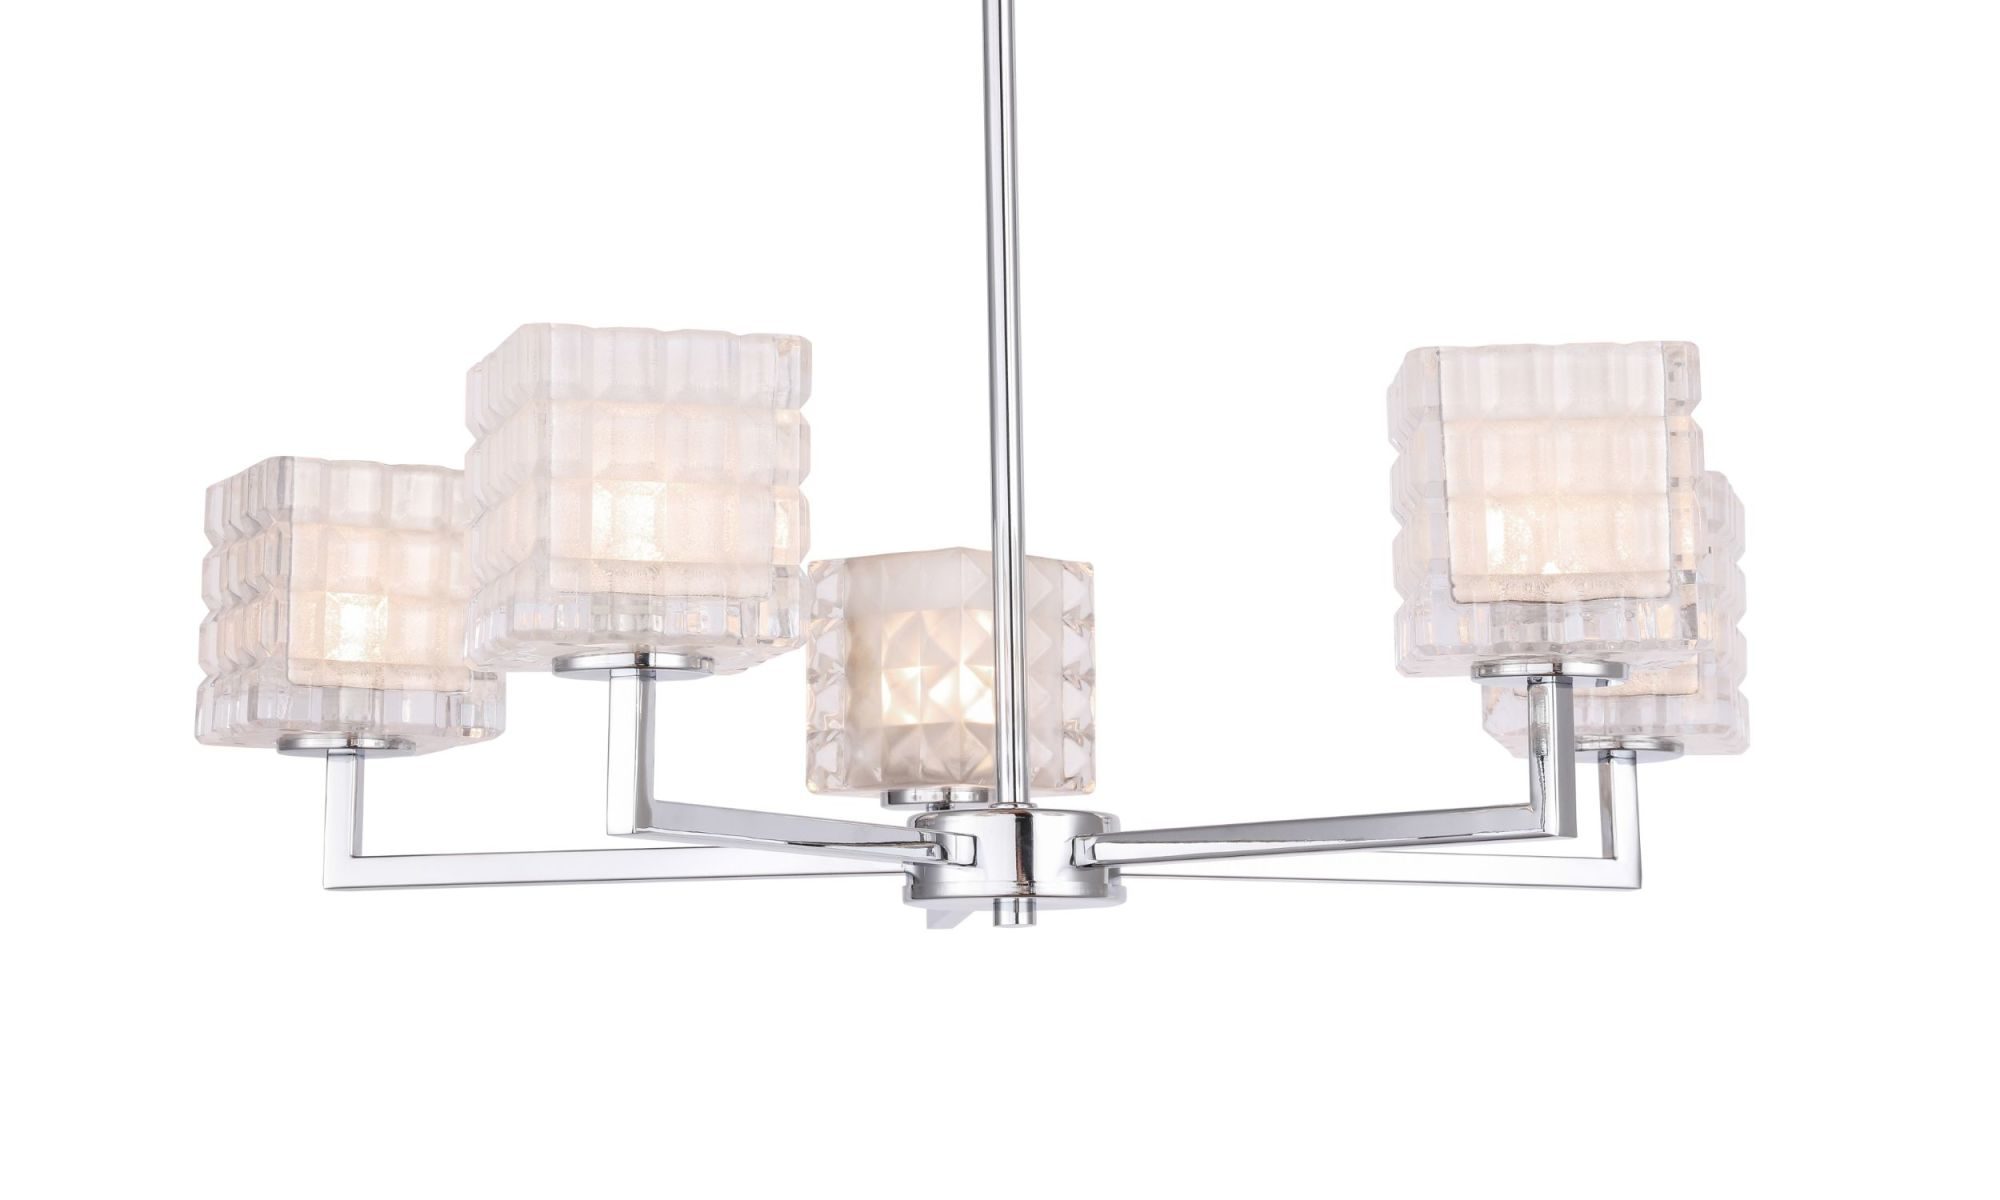 Details About Woodbridge Lighting 18615 Candice 5 Light 24 Wide Chandelier Chrome Grid